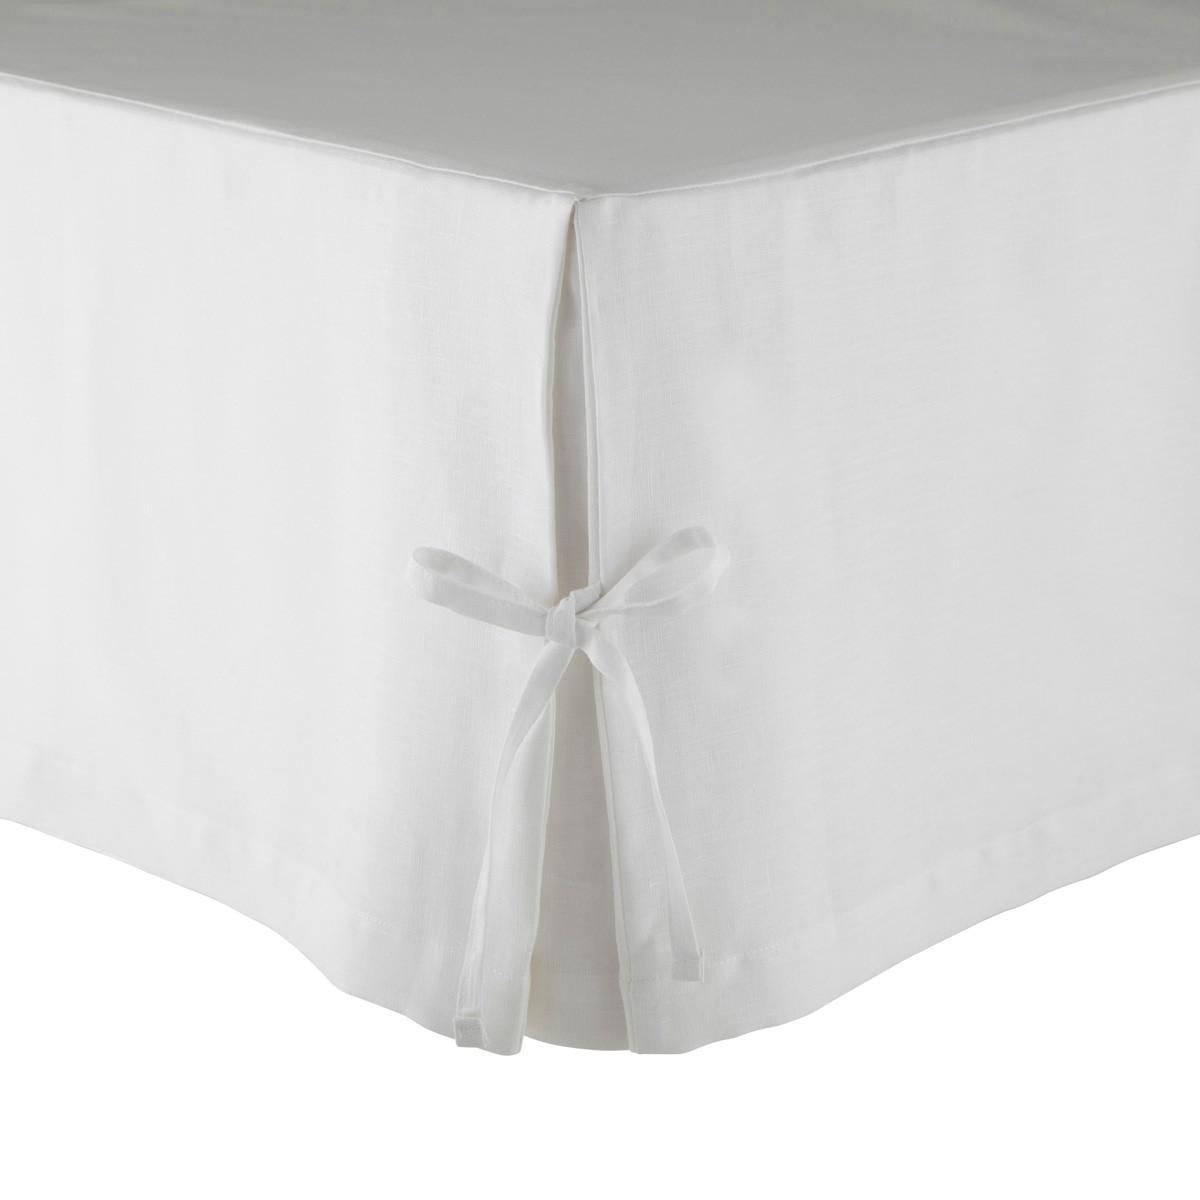 Cache sommier Lin Blanc 160 x 200 cm (photo)